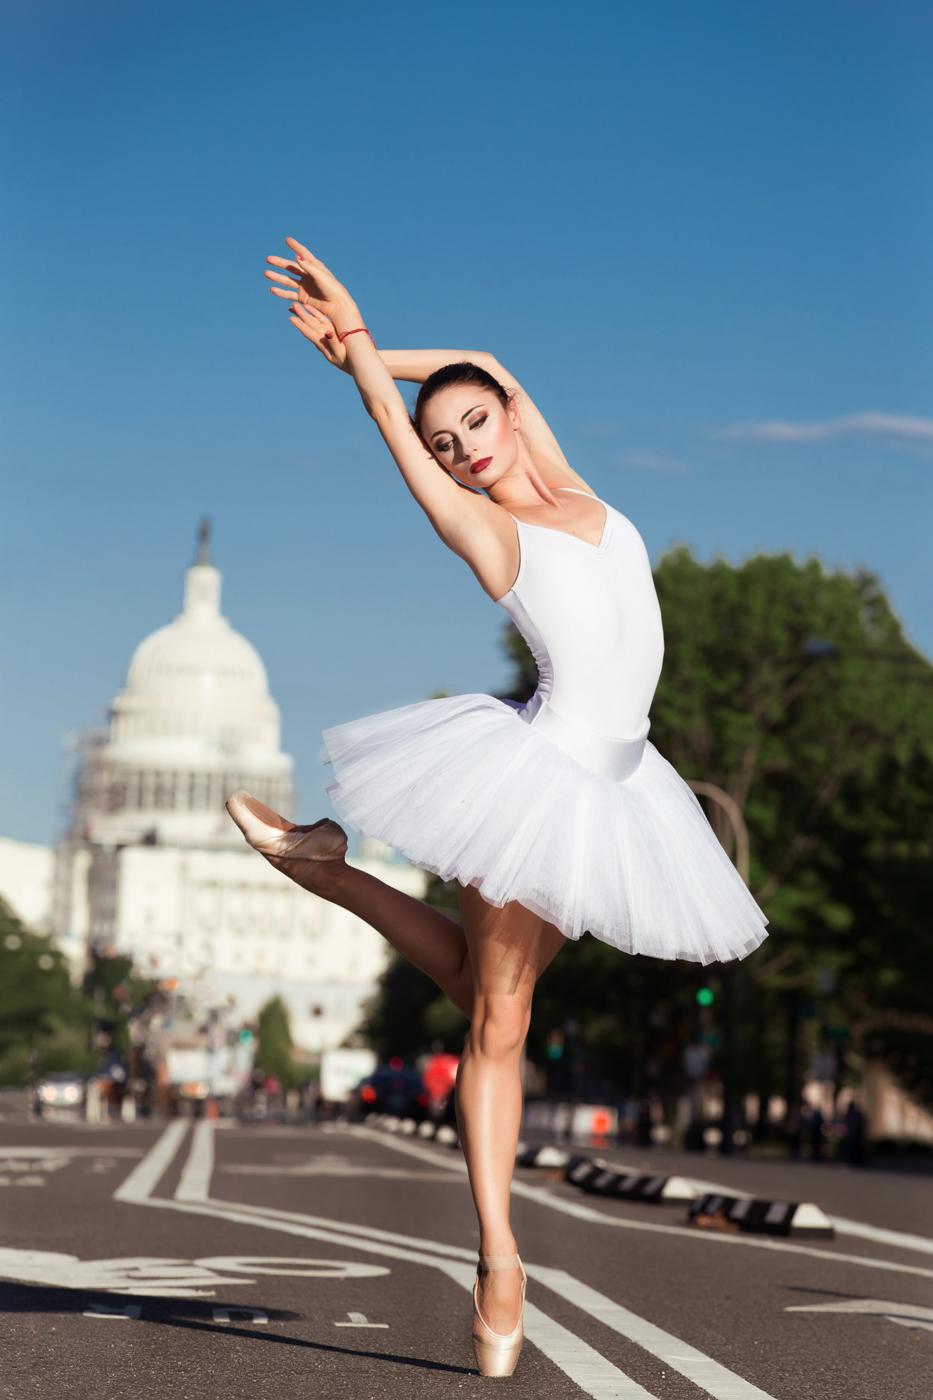 russian-ballet-dancer-on-the-street-of-washington-dc-ksenia-pro-photography-1